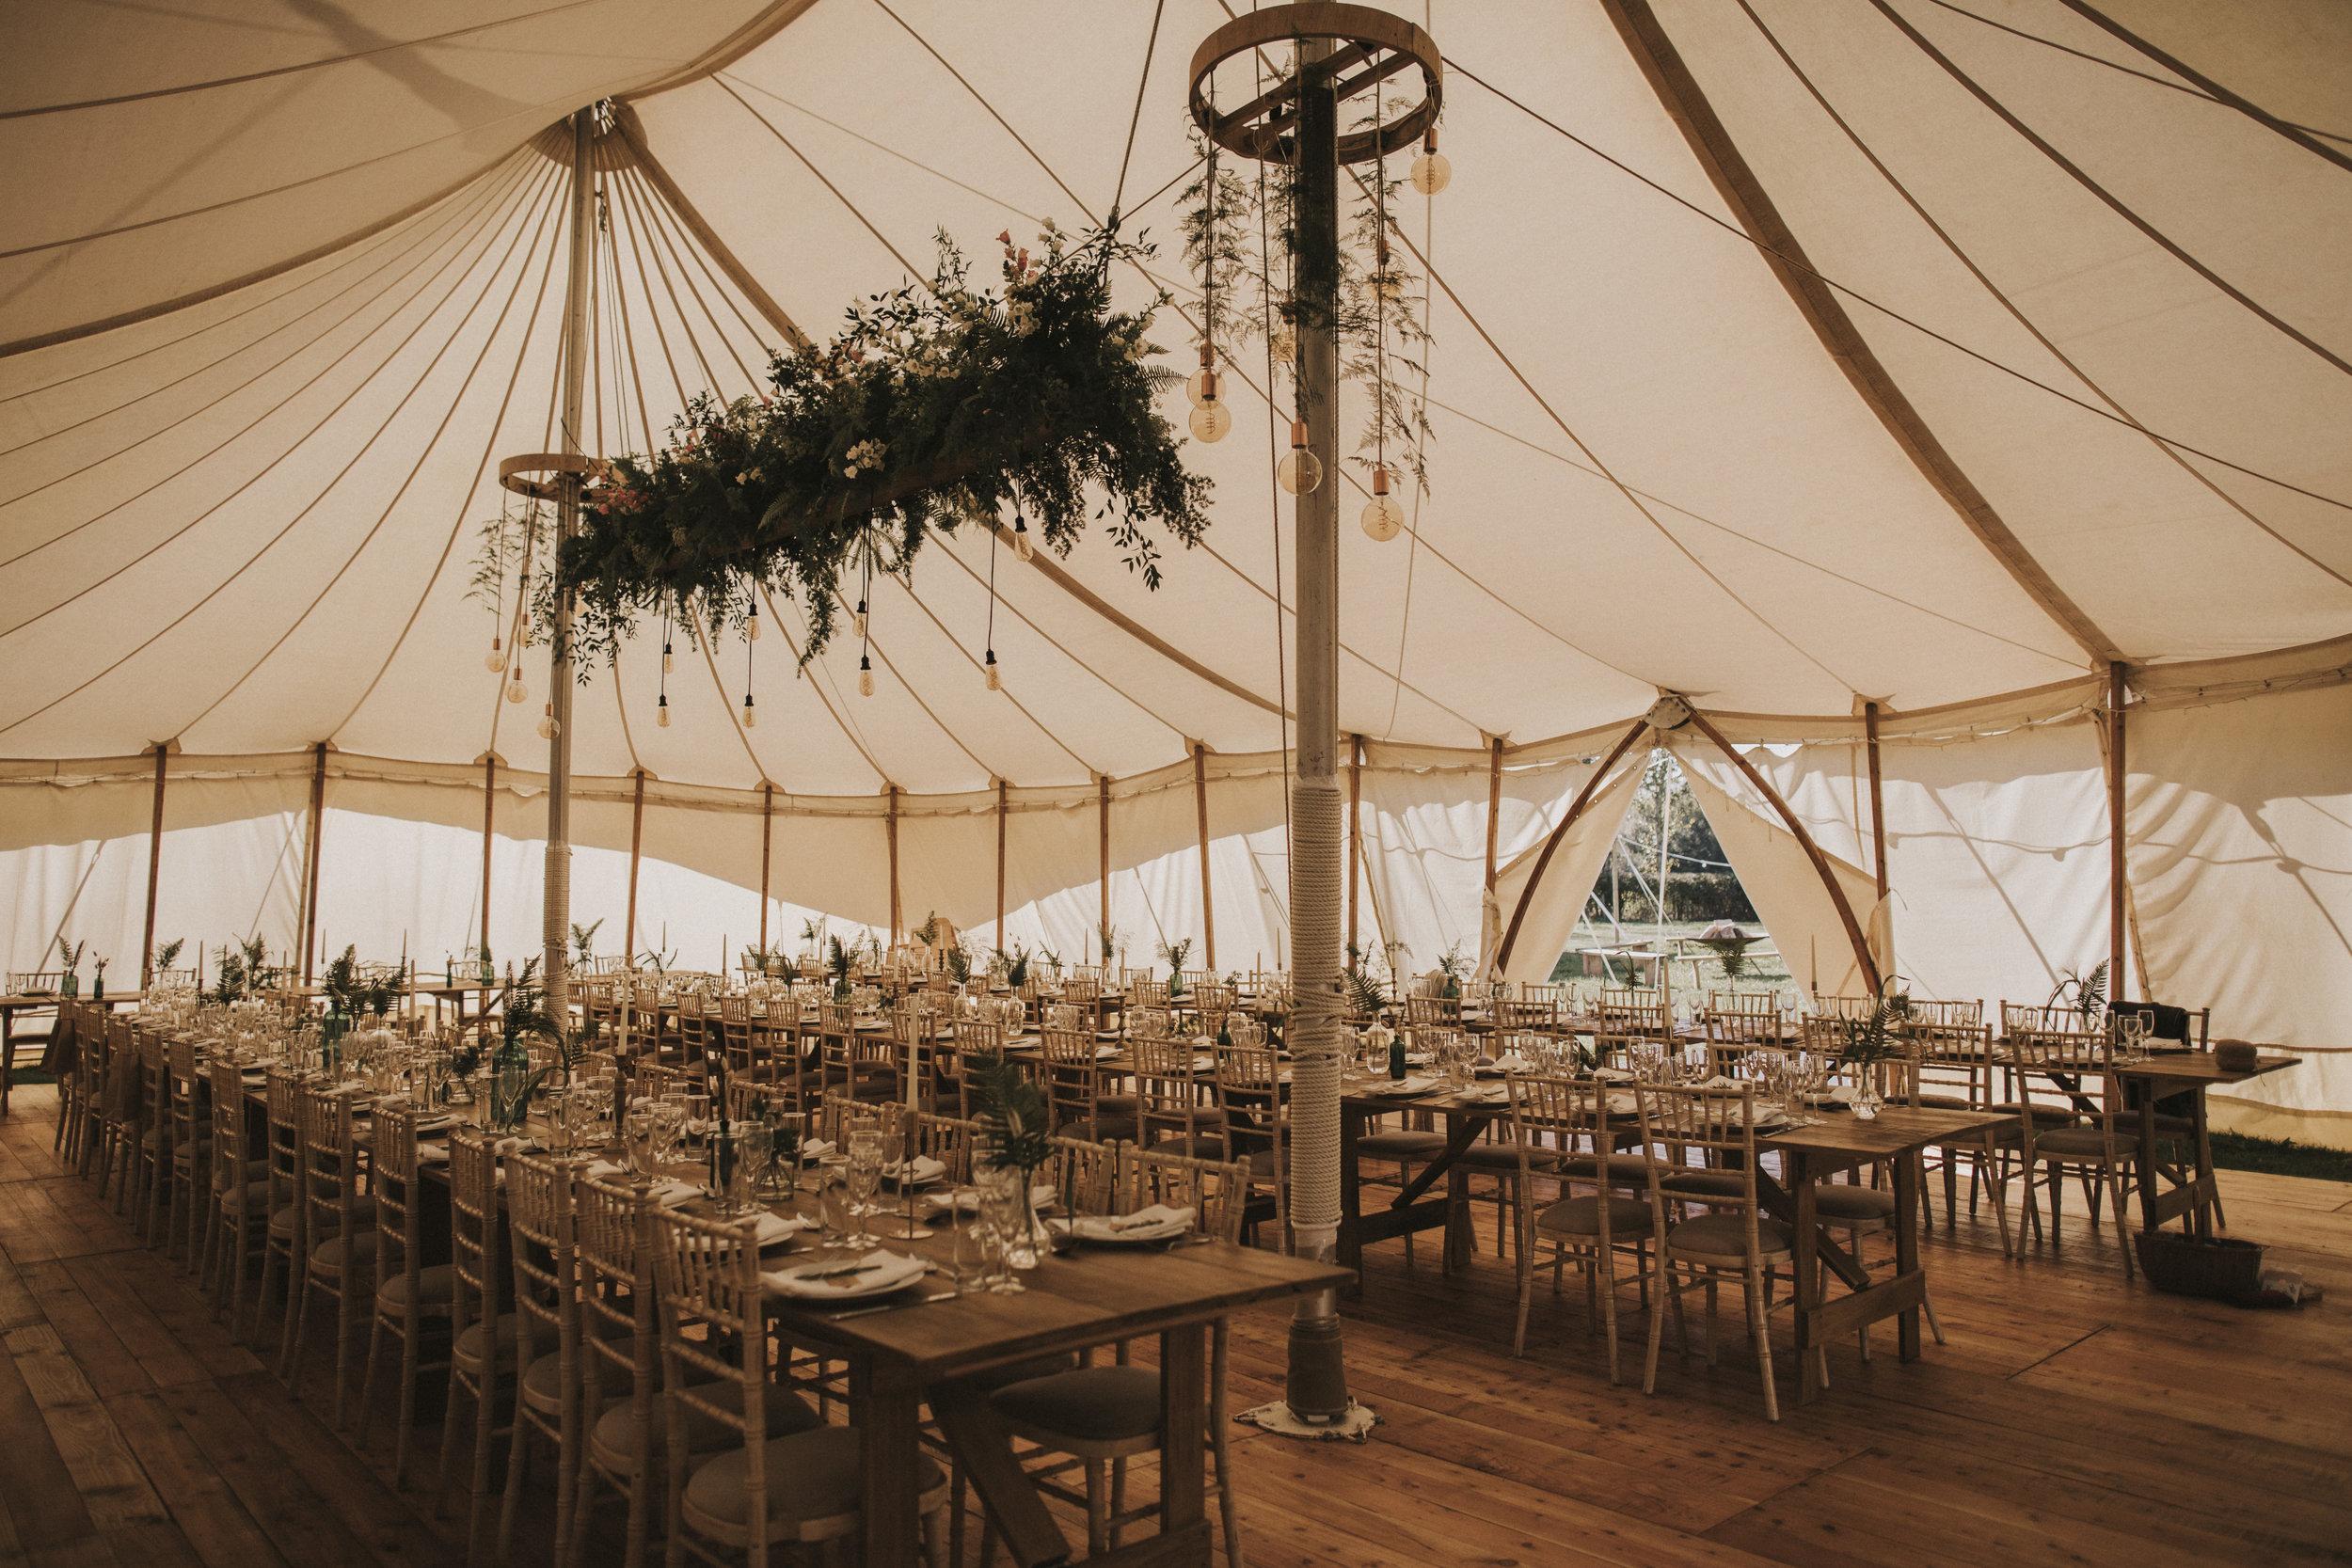 sherry tent wedding